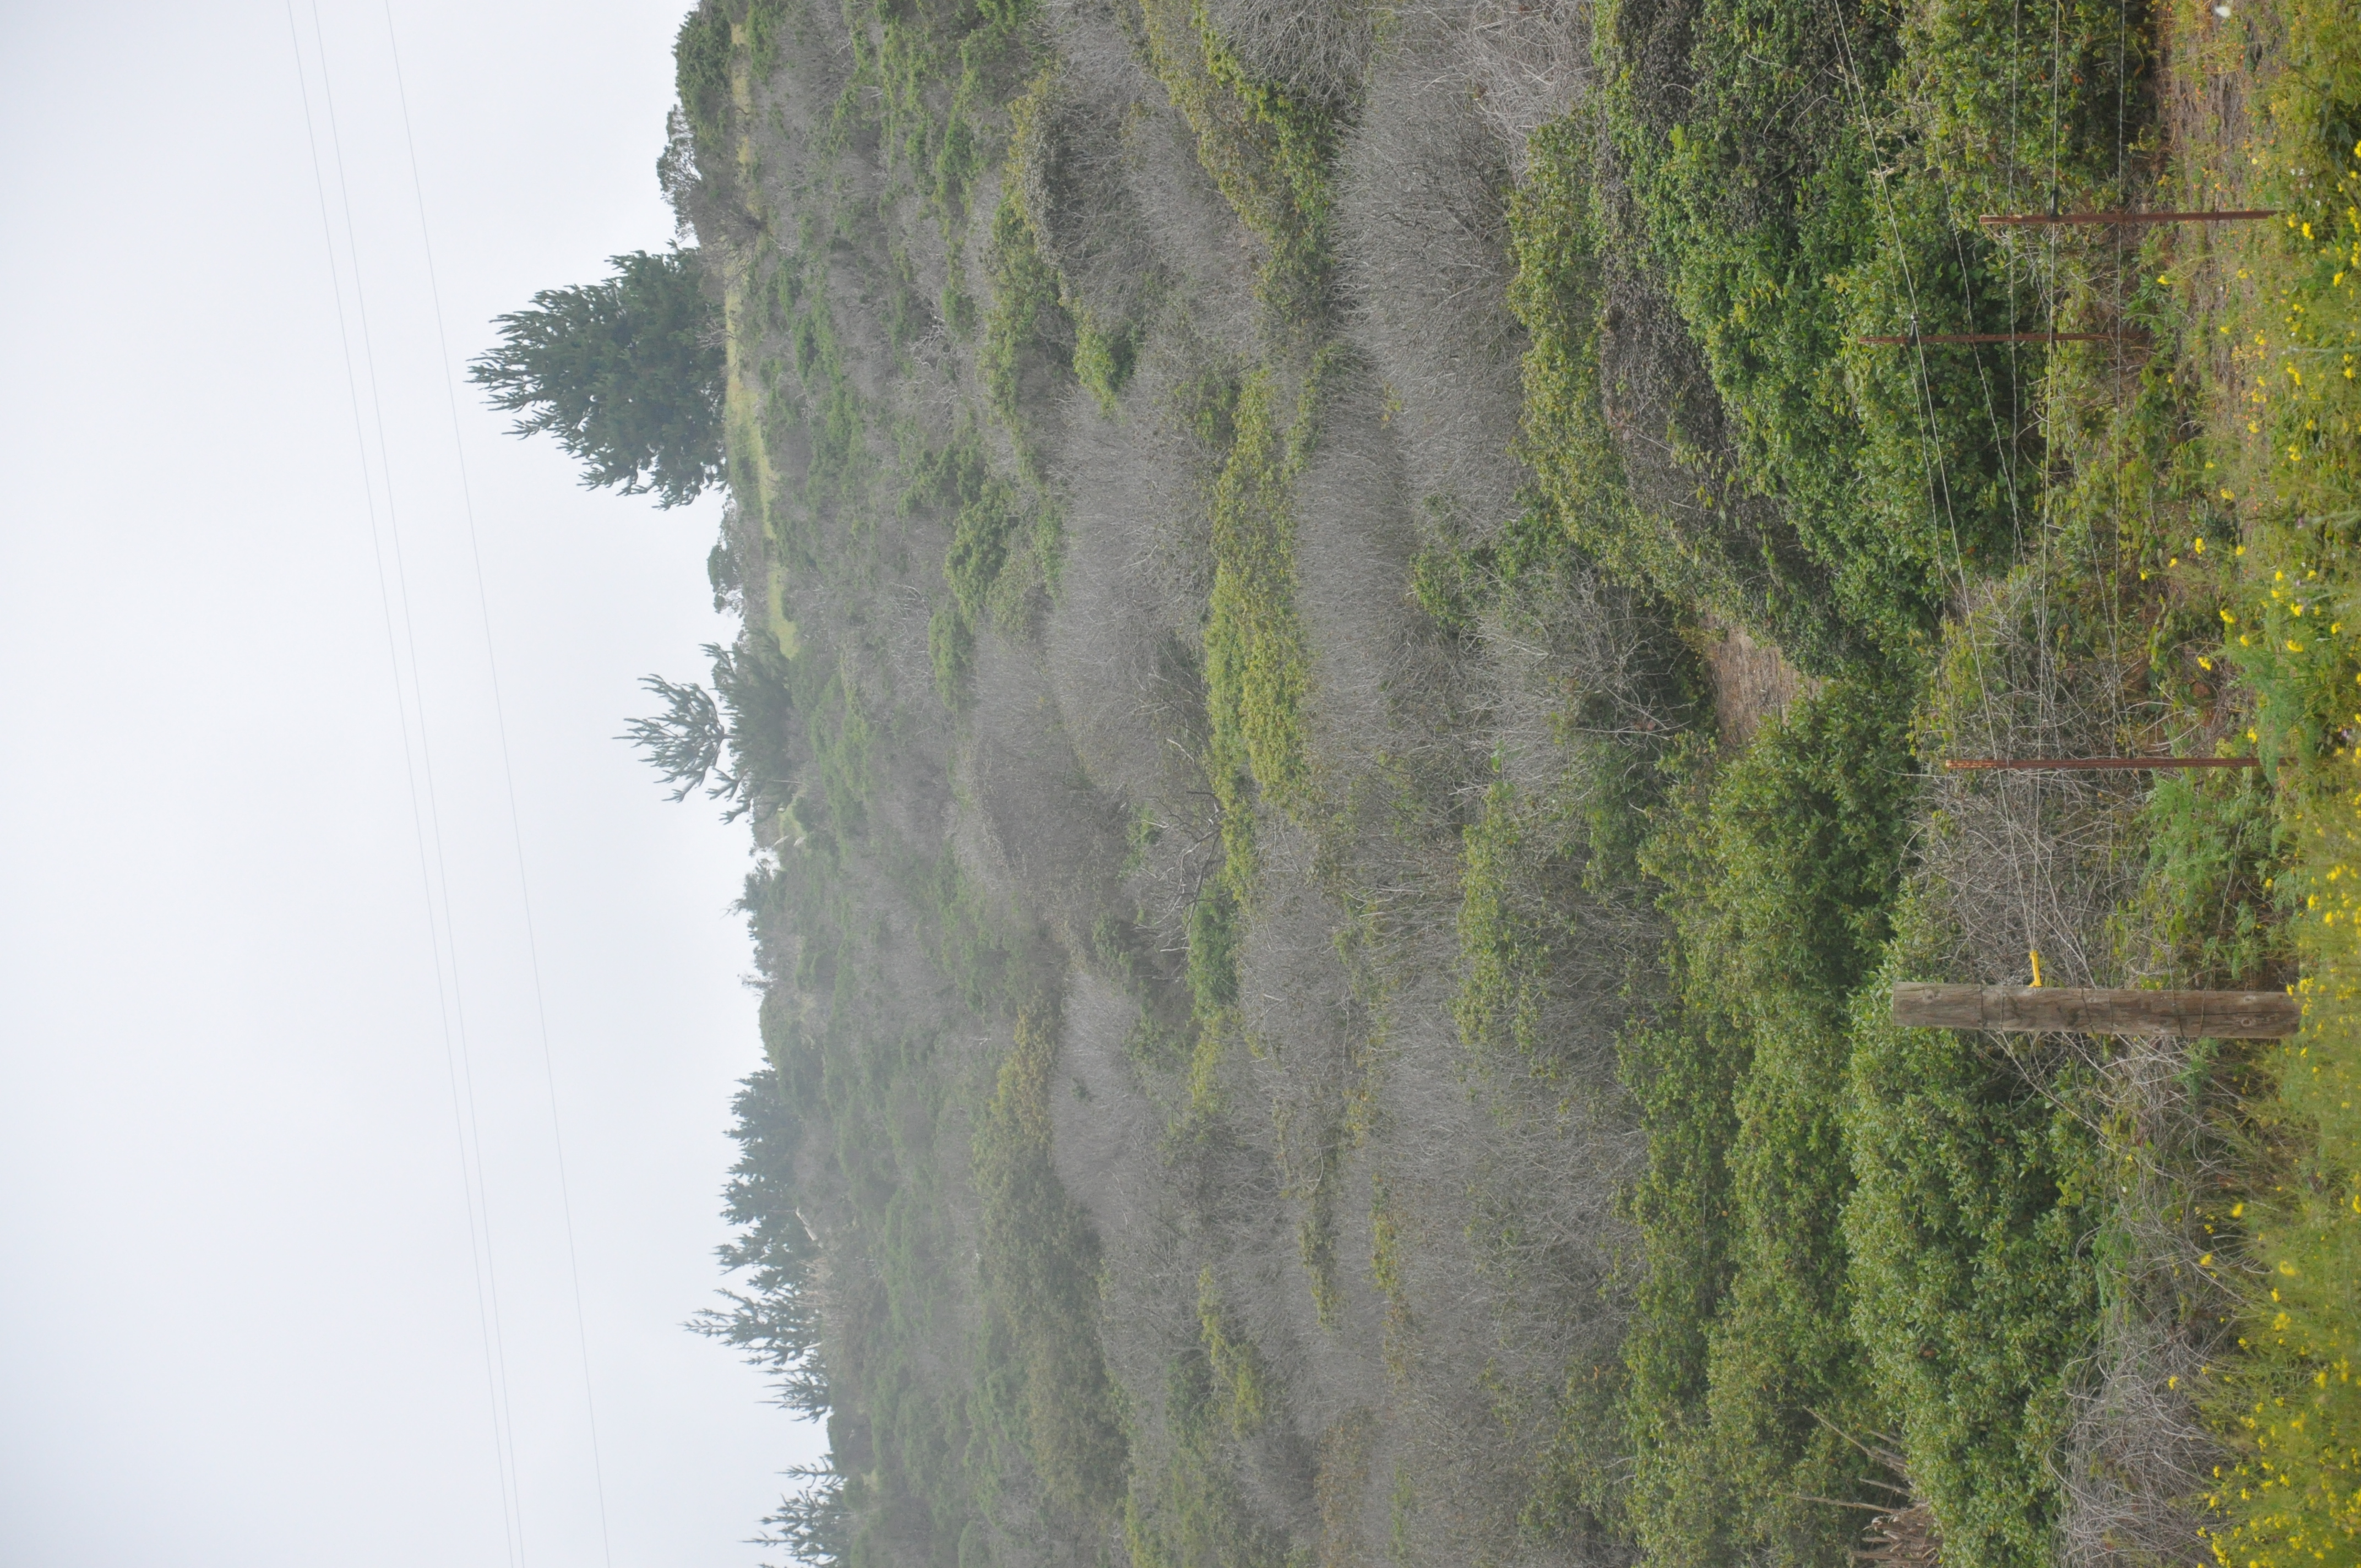 Dead trees among live trees